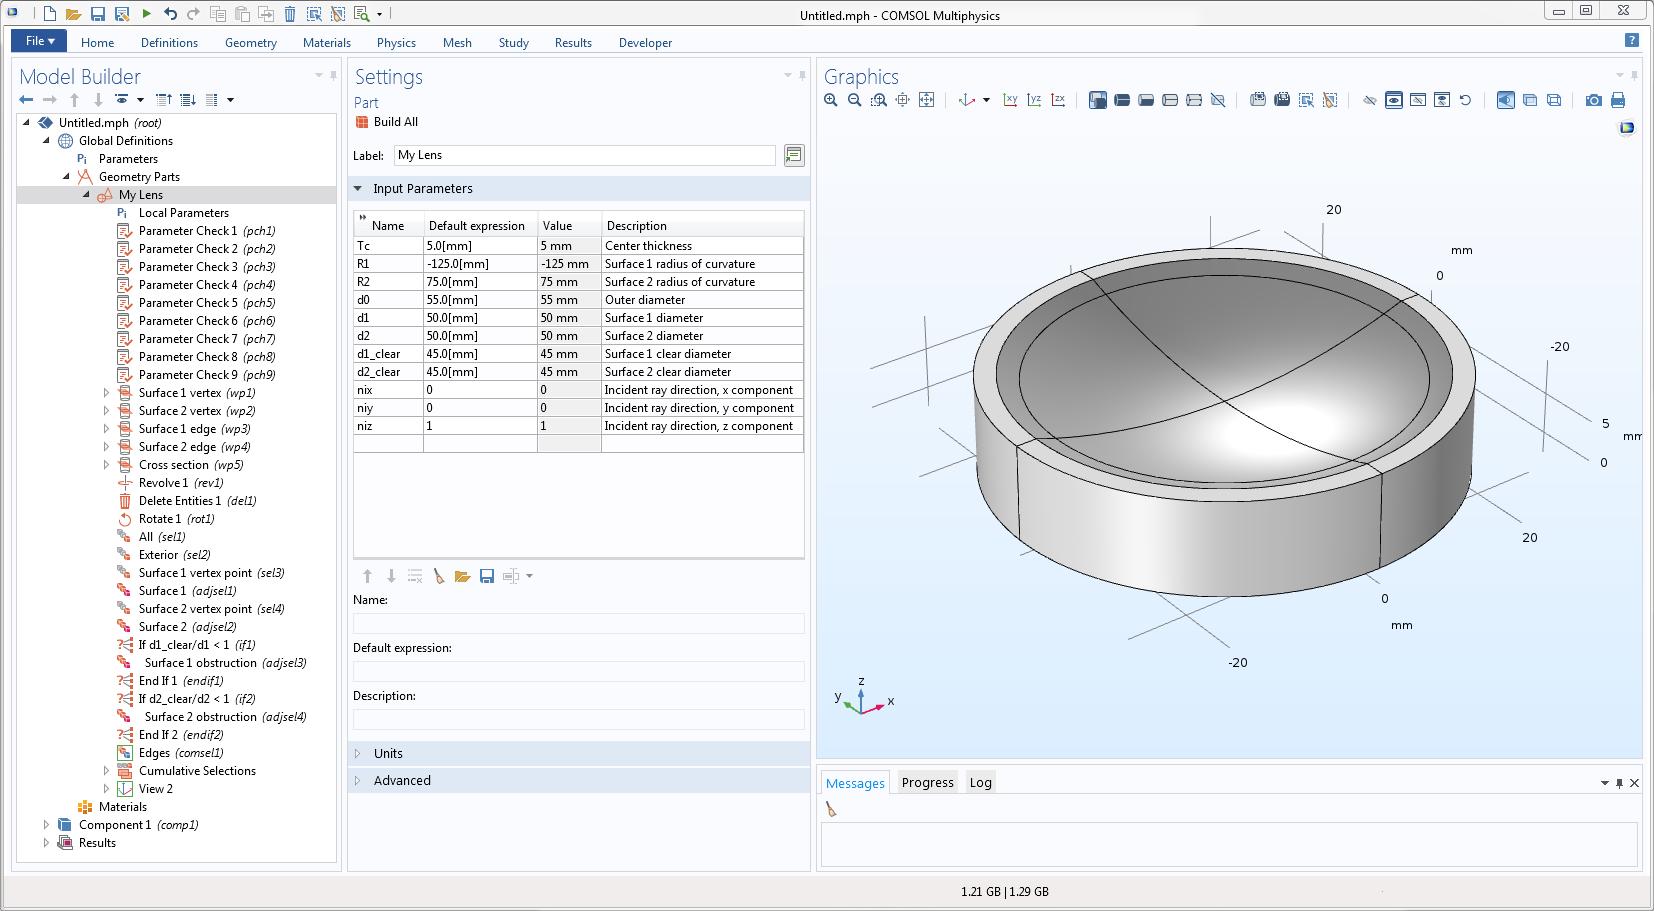 COMSOL Multiphysics® GUI 截图显示用户定义几何零件示例。